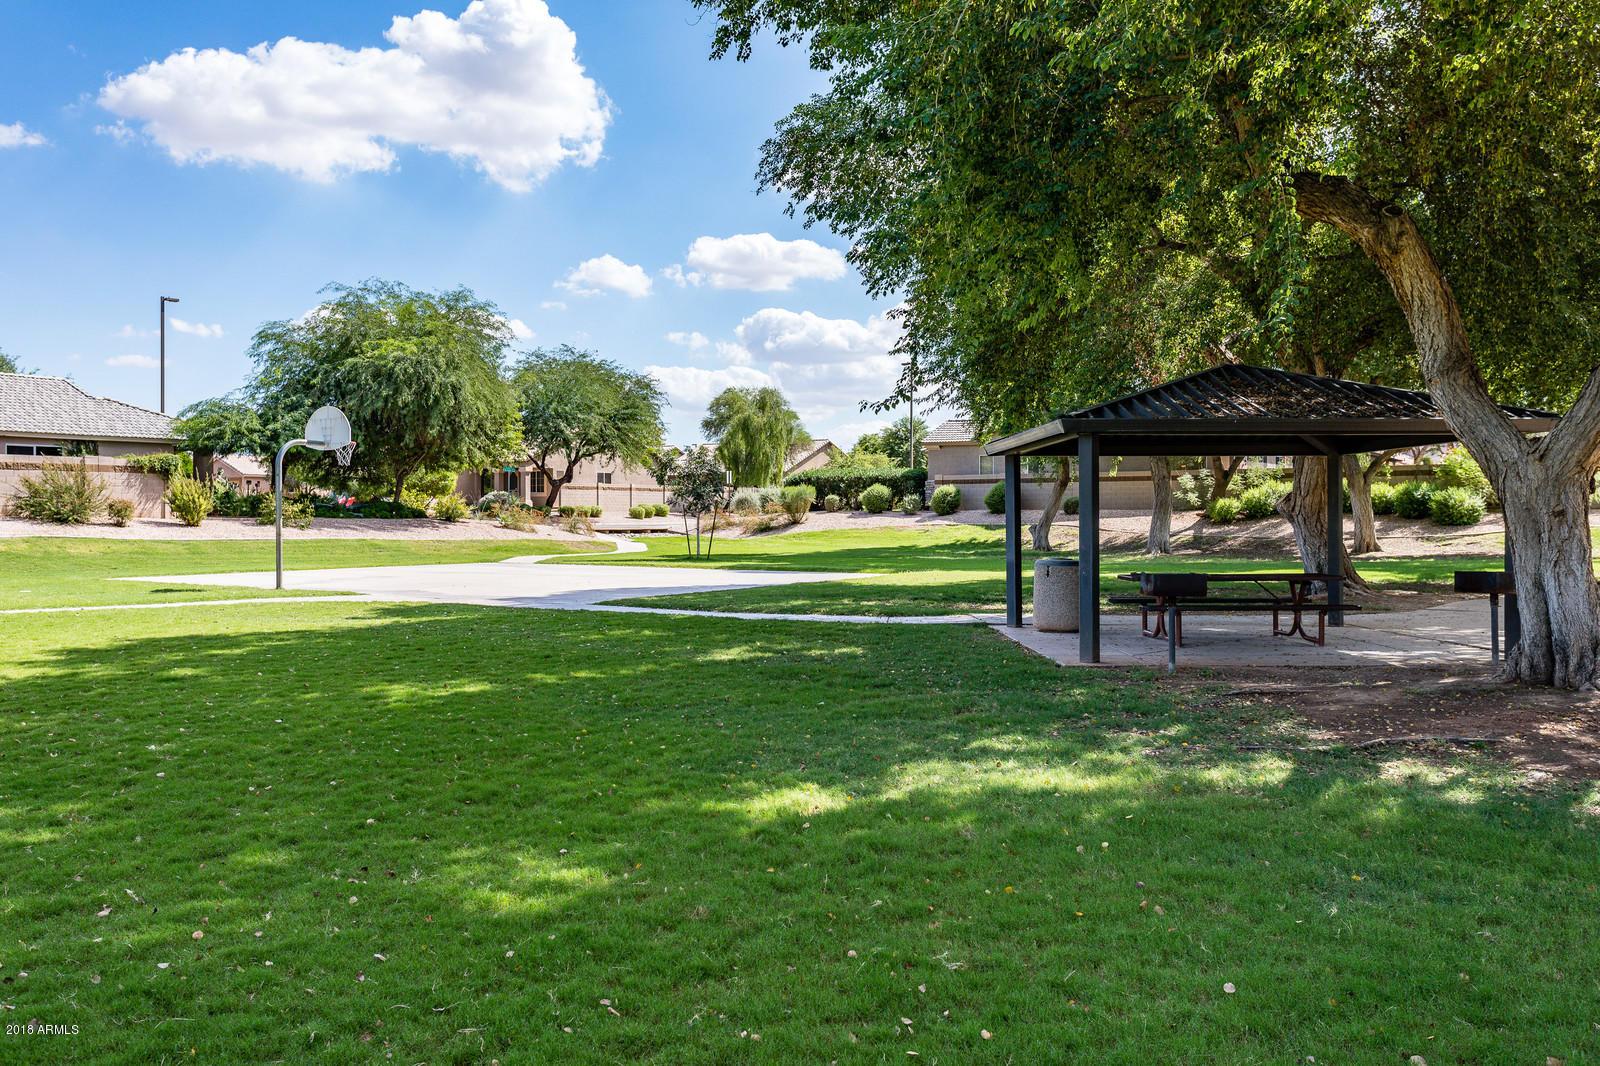 MLS 5829835 2897 E TERRACE Avenue, Gilbert, AZ 85234 Gilbert AZ Tone Ranch Estates